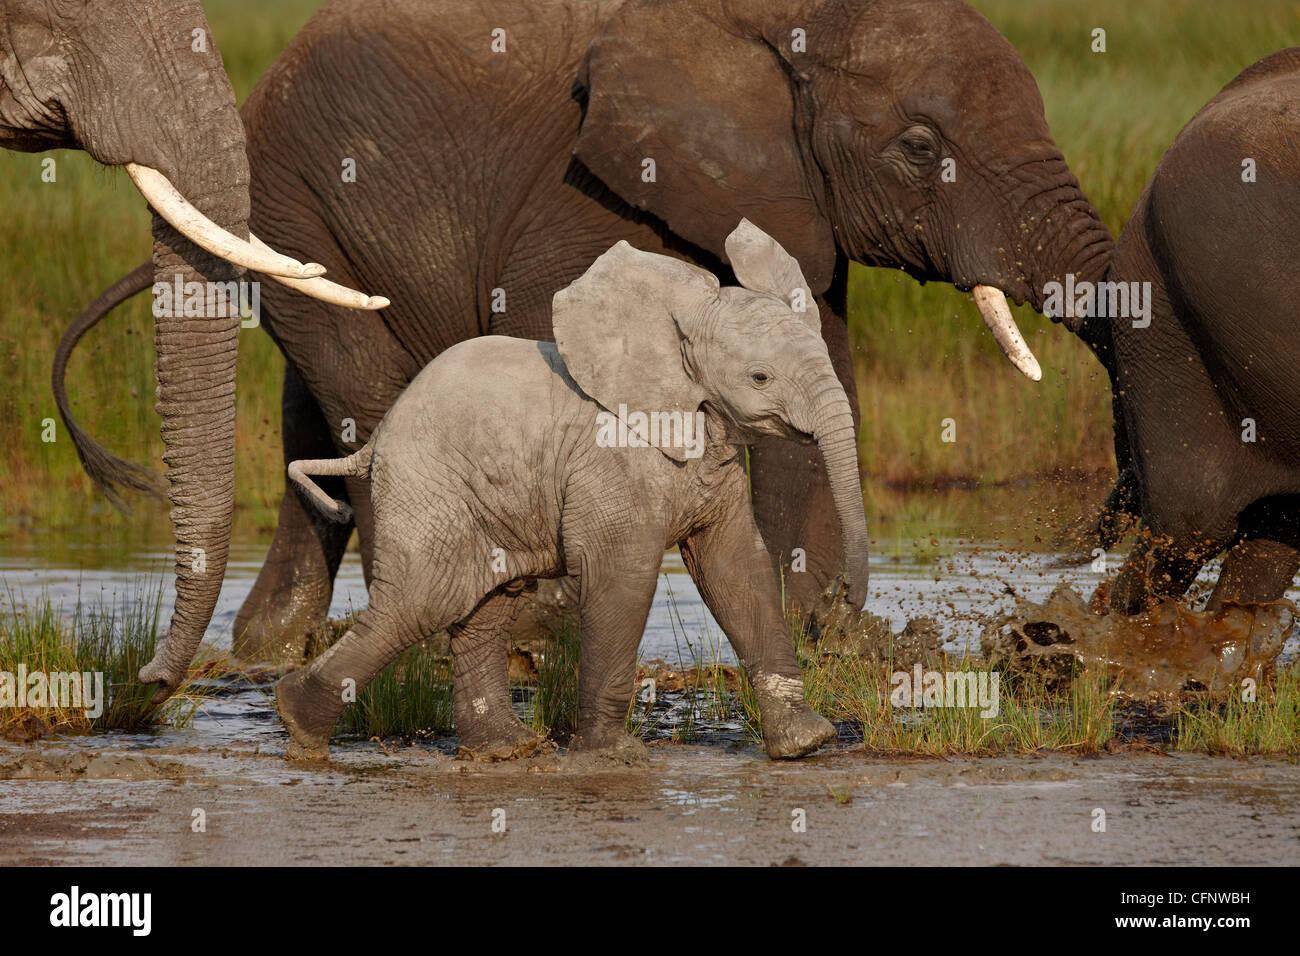 Baby African elephant (Loxodonta africana), Serengeti National Park, Tanzania, East Africa, Africa - Stock Image